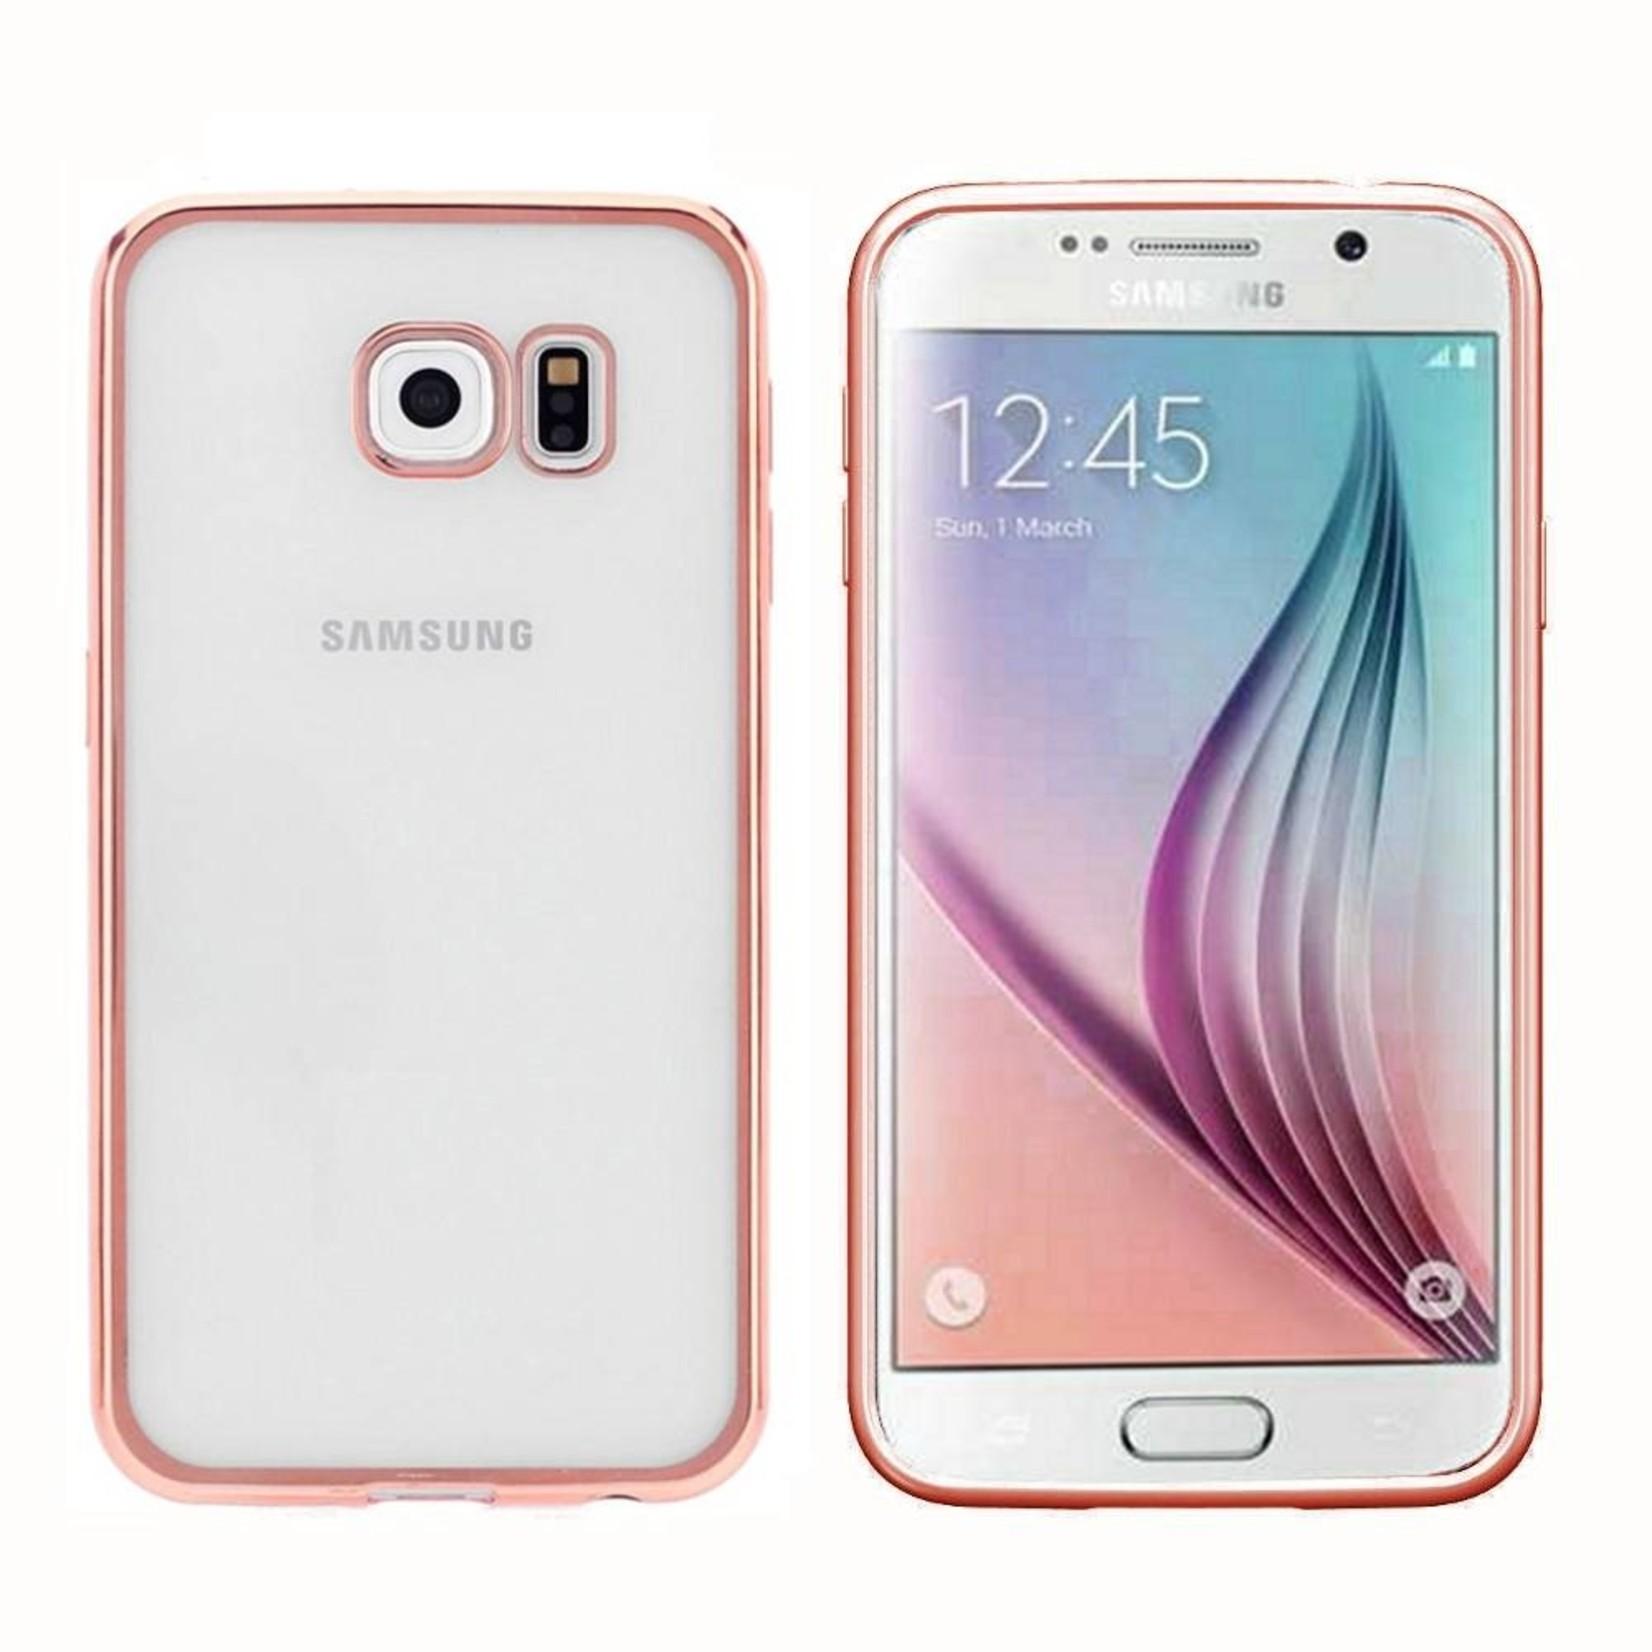 Colorfone Hoesje CoolSkin Bumper Clear Samsung Galaxy S7 Edge Rosé Goud